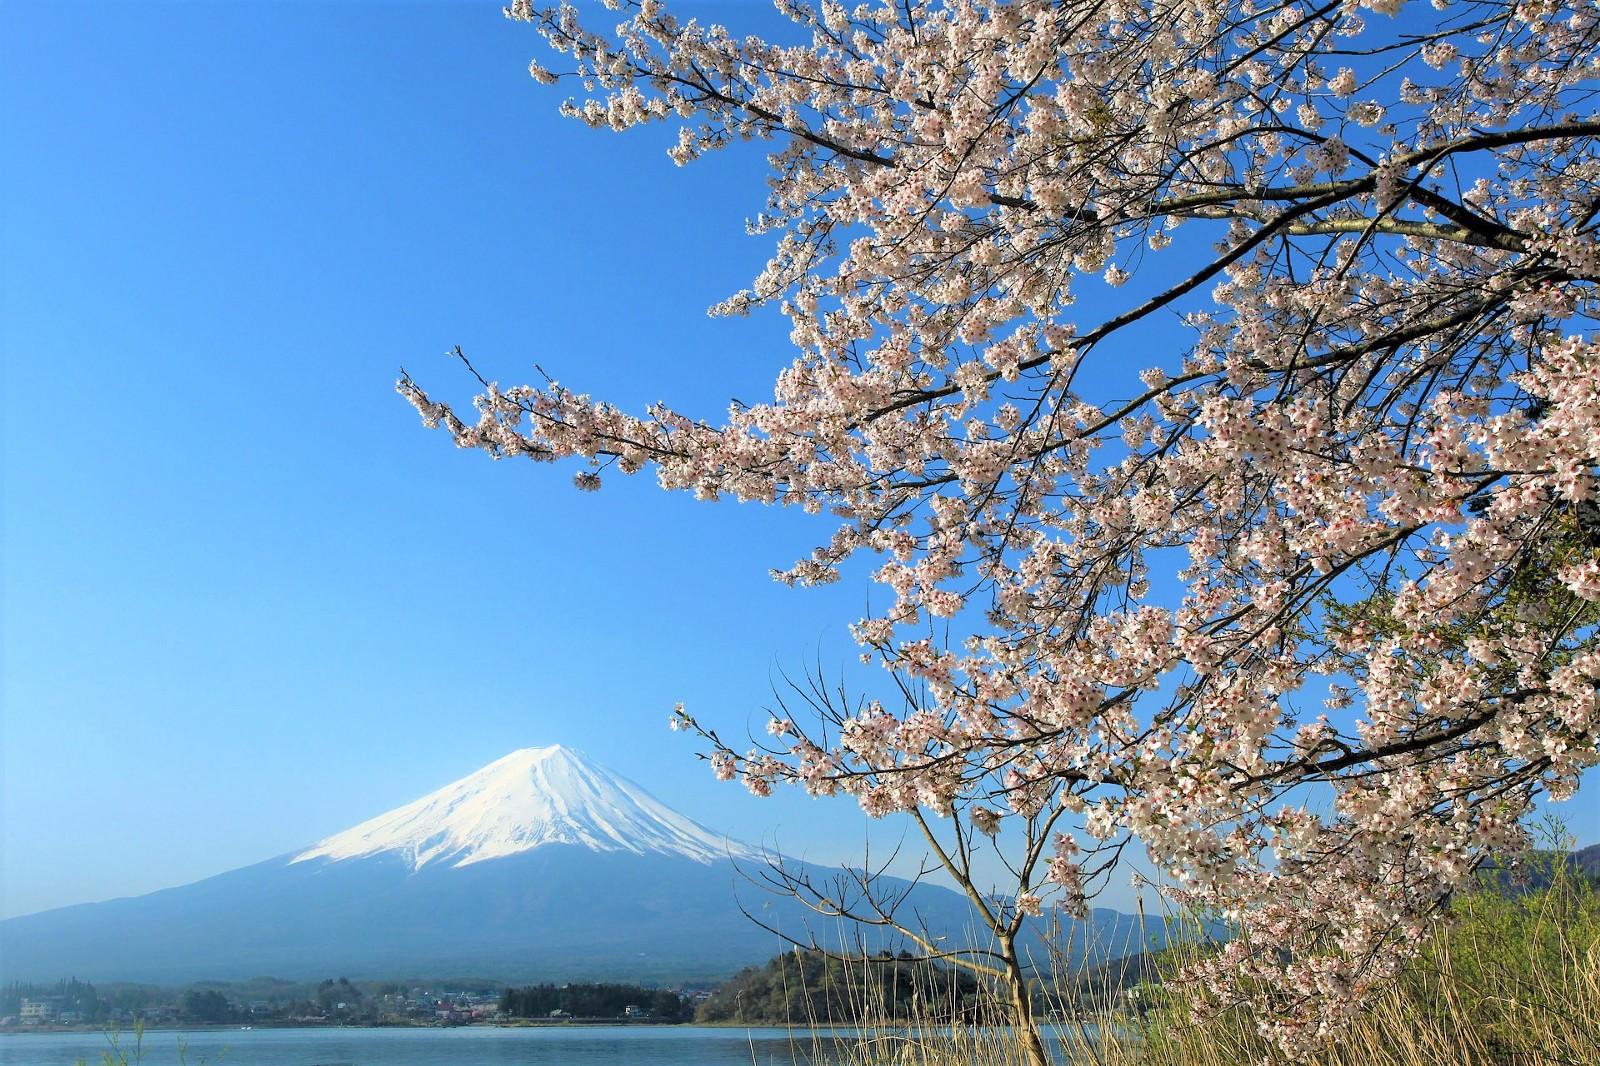 sewa mobil jepang Paket Wisata Tour Jepang Gunung Fuji sehari